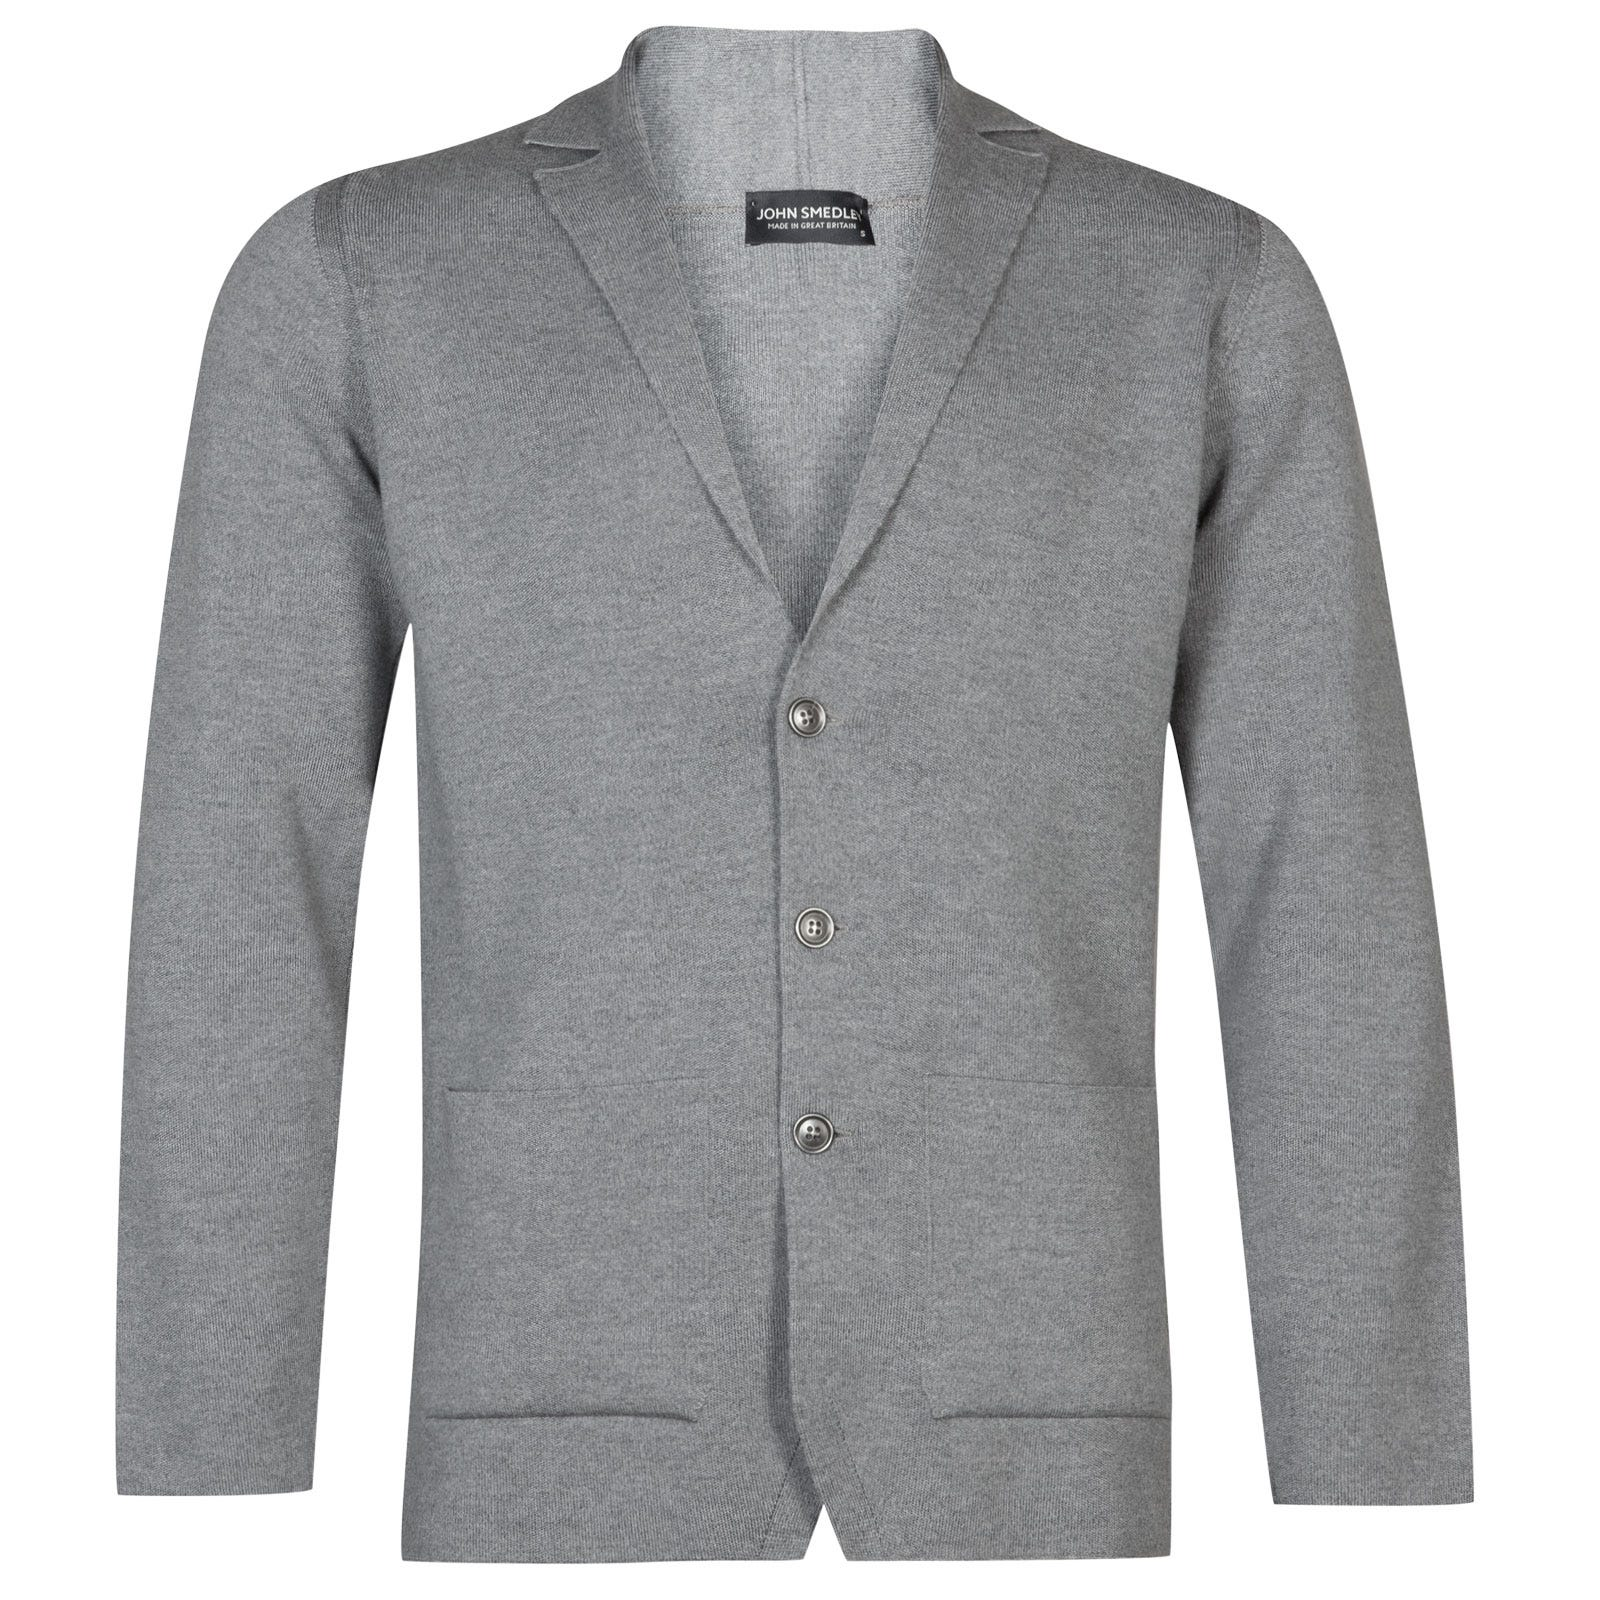 John Smedley Oxland Merino Wool Jacket in Silver-M